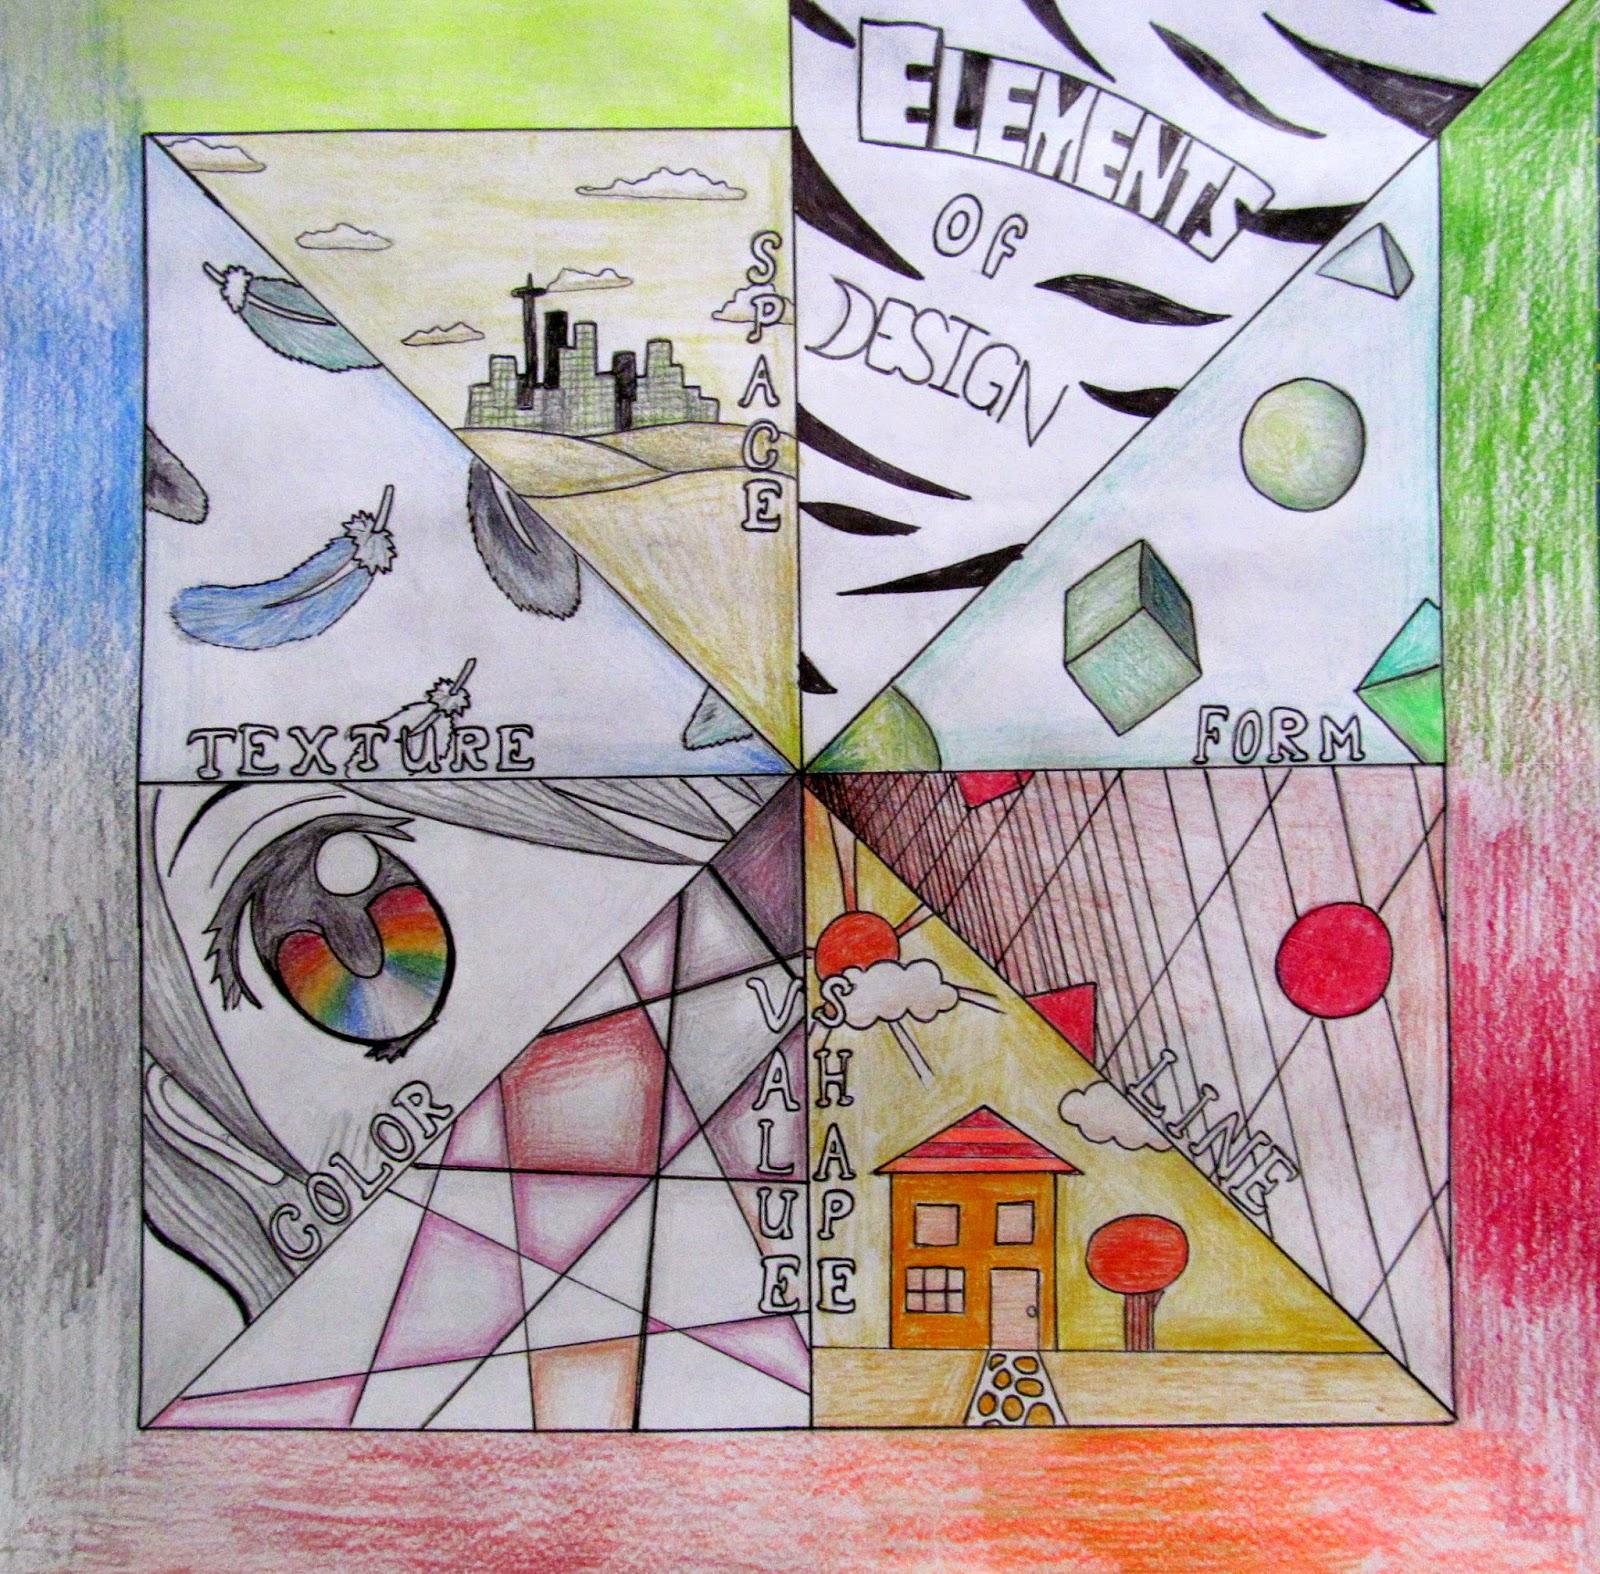 Ms. Eaton's Phileonia Artonian: Elements of Art Radial Review